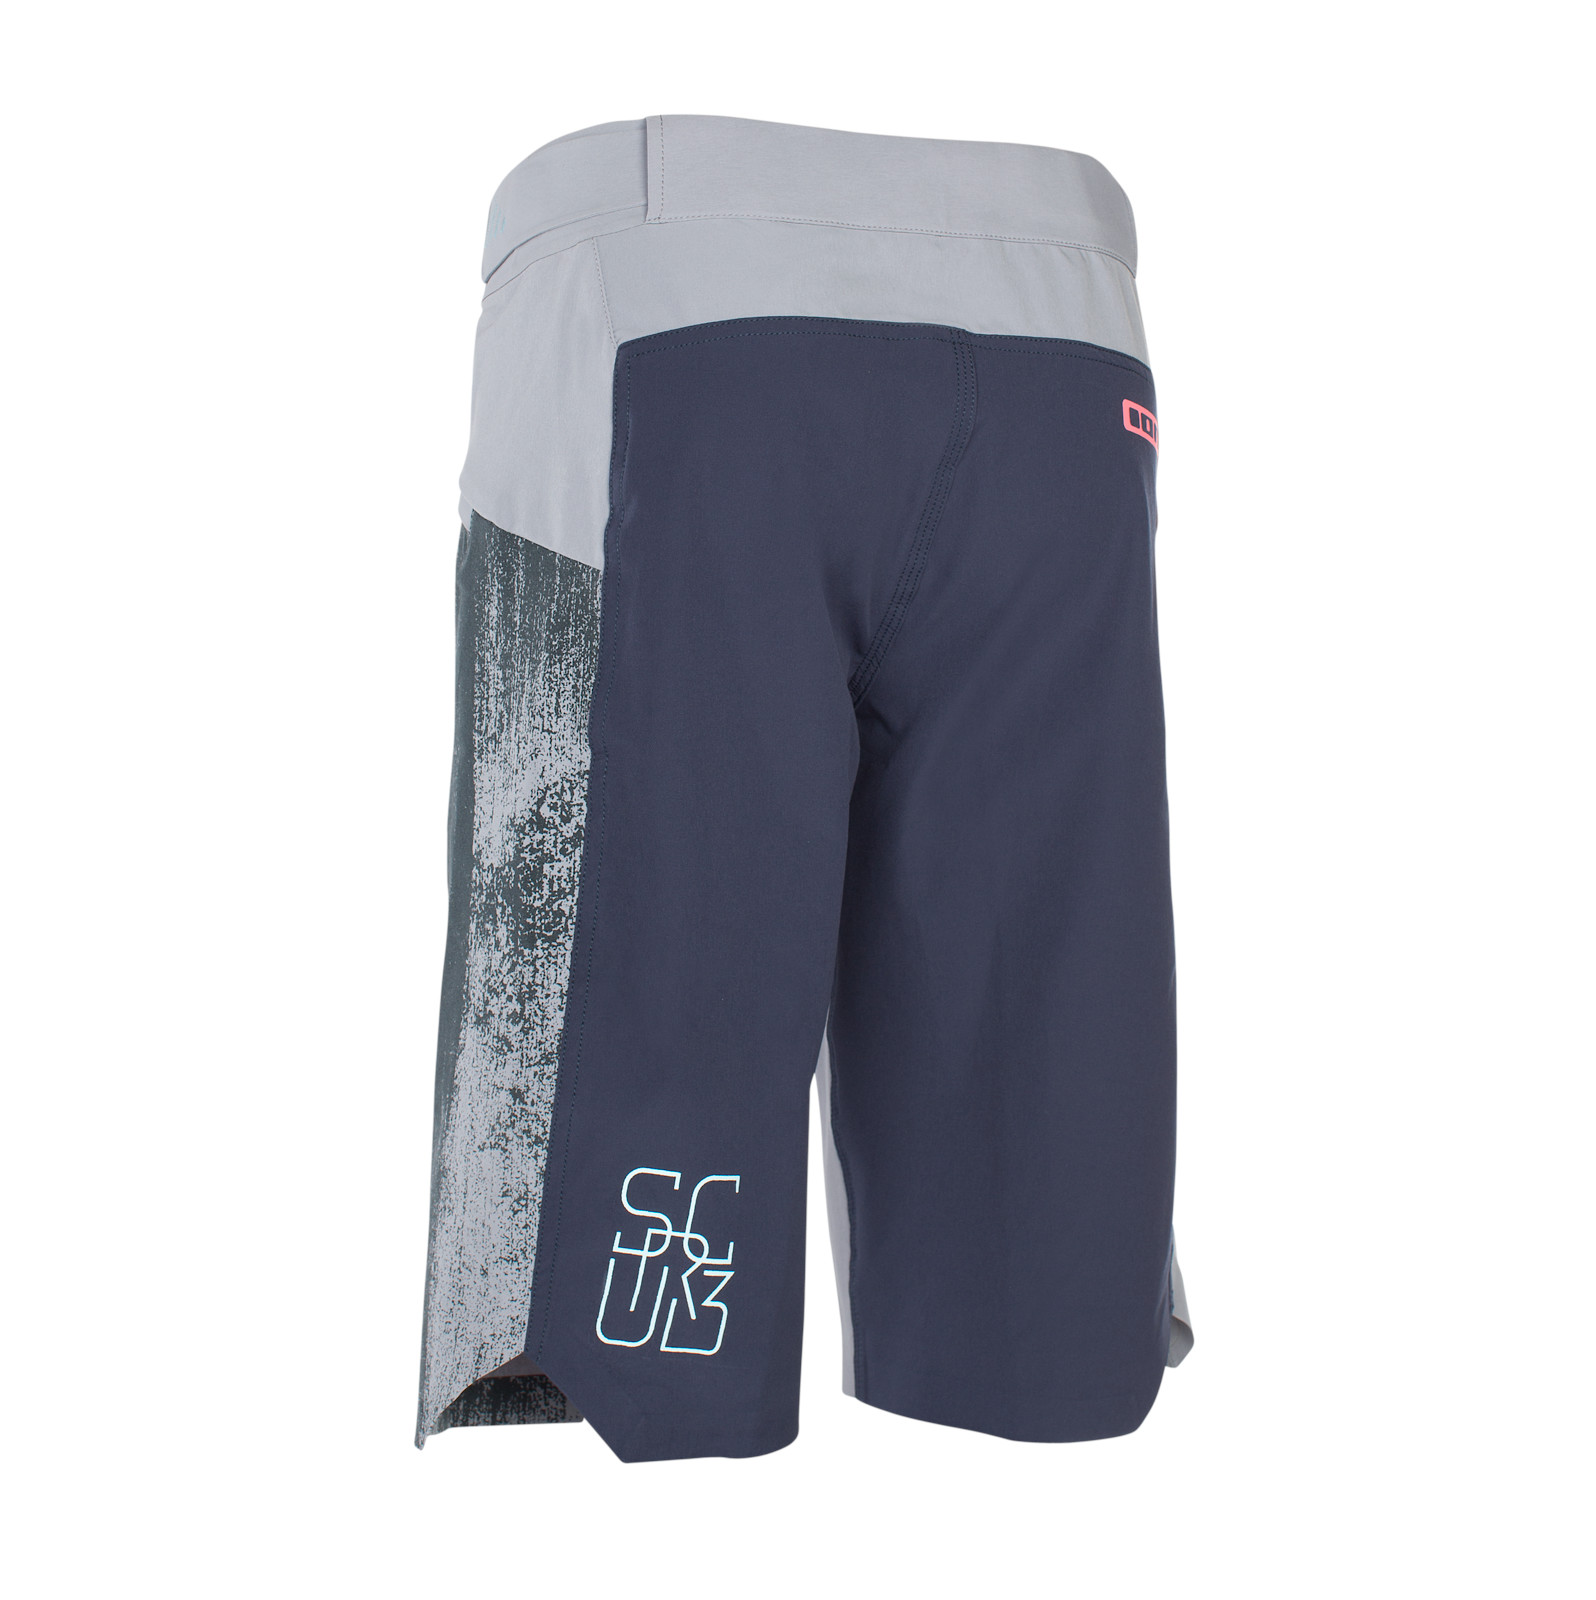 8cae7f26308 ION Scrub Amp Women's Shorts - Reviews, Comparisons, Specs ...